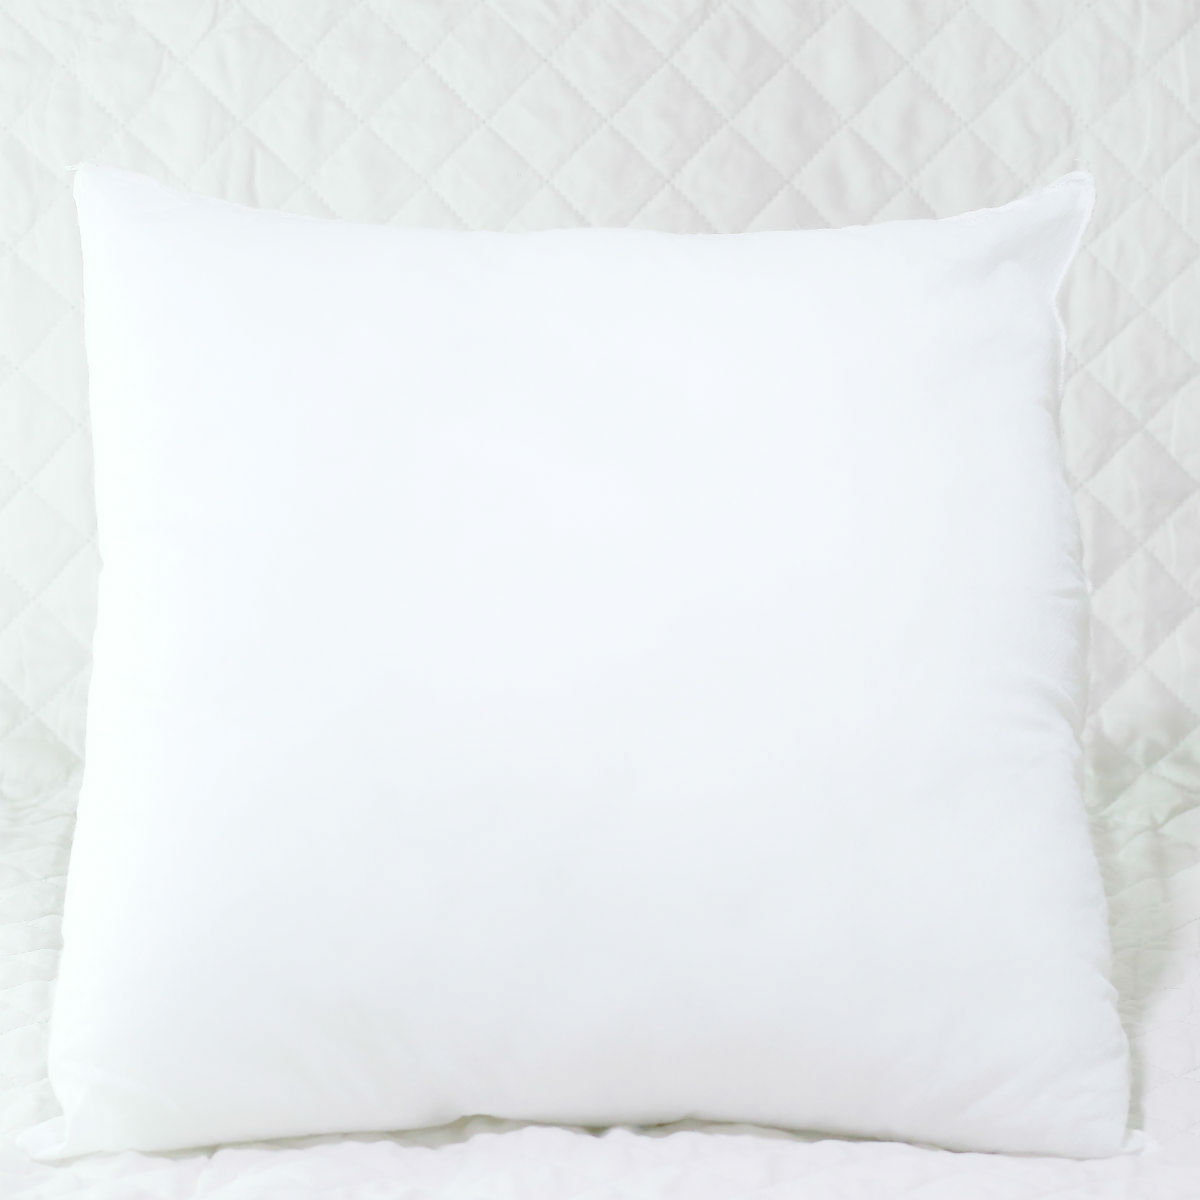 a61ed22f9 Enchimento para almofada - 45 x 45 cm - Teixeira Têxtil